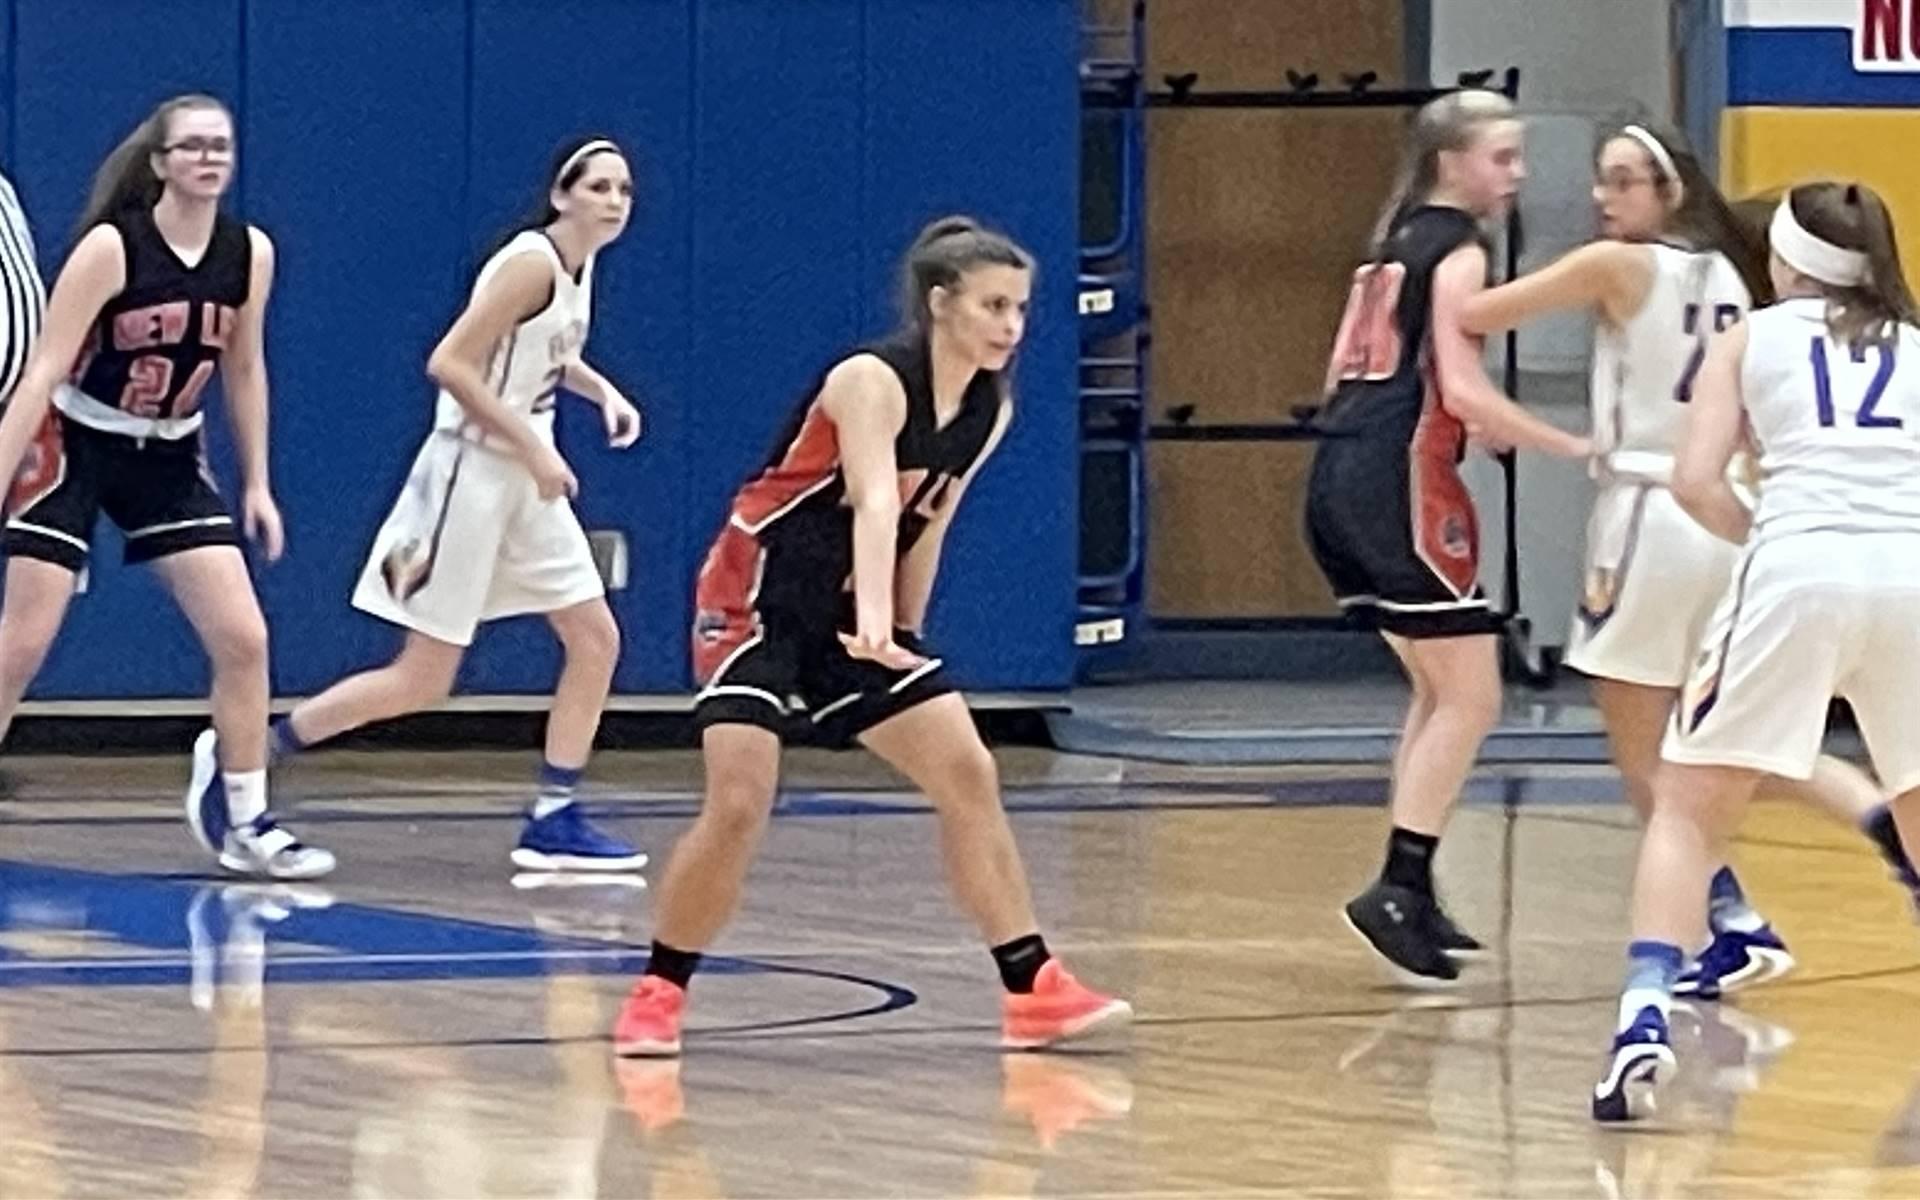 JV Basketball taking on Philo